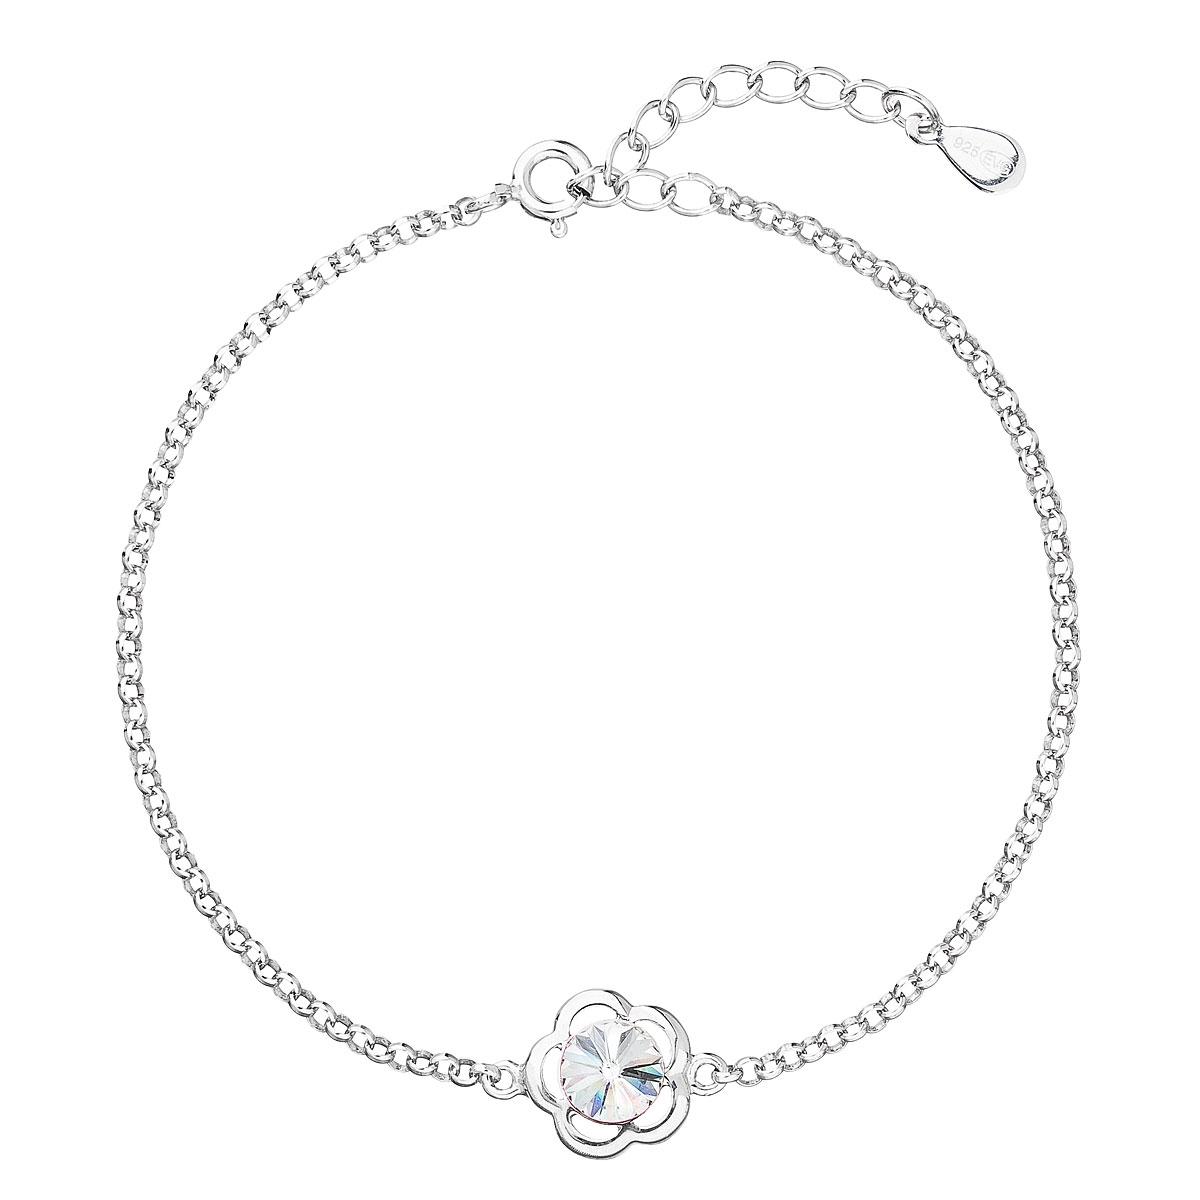 Stříbrný náramek s tyrkysovým kamenem Crystals from Swarovski® Crystal EG7057-CR